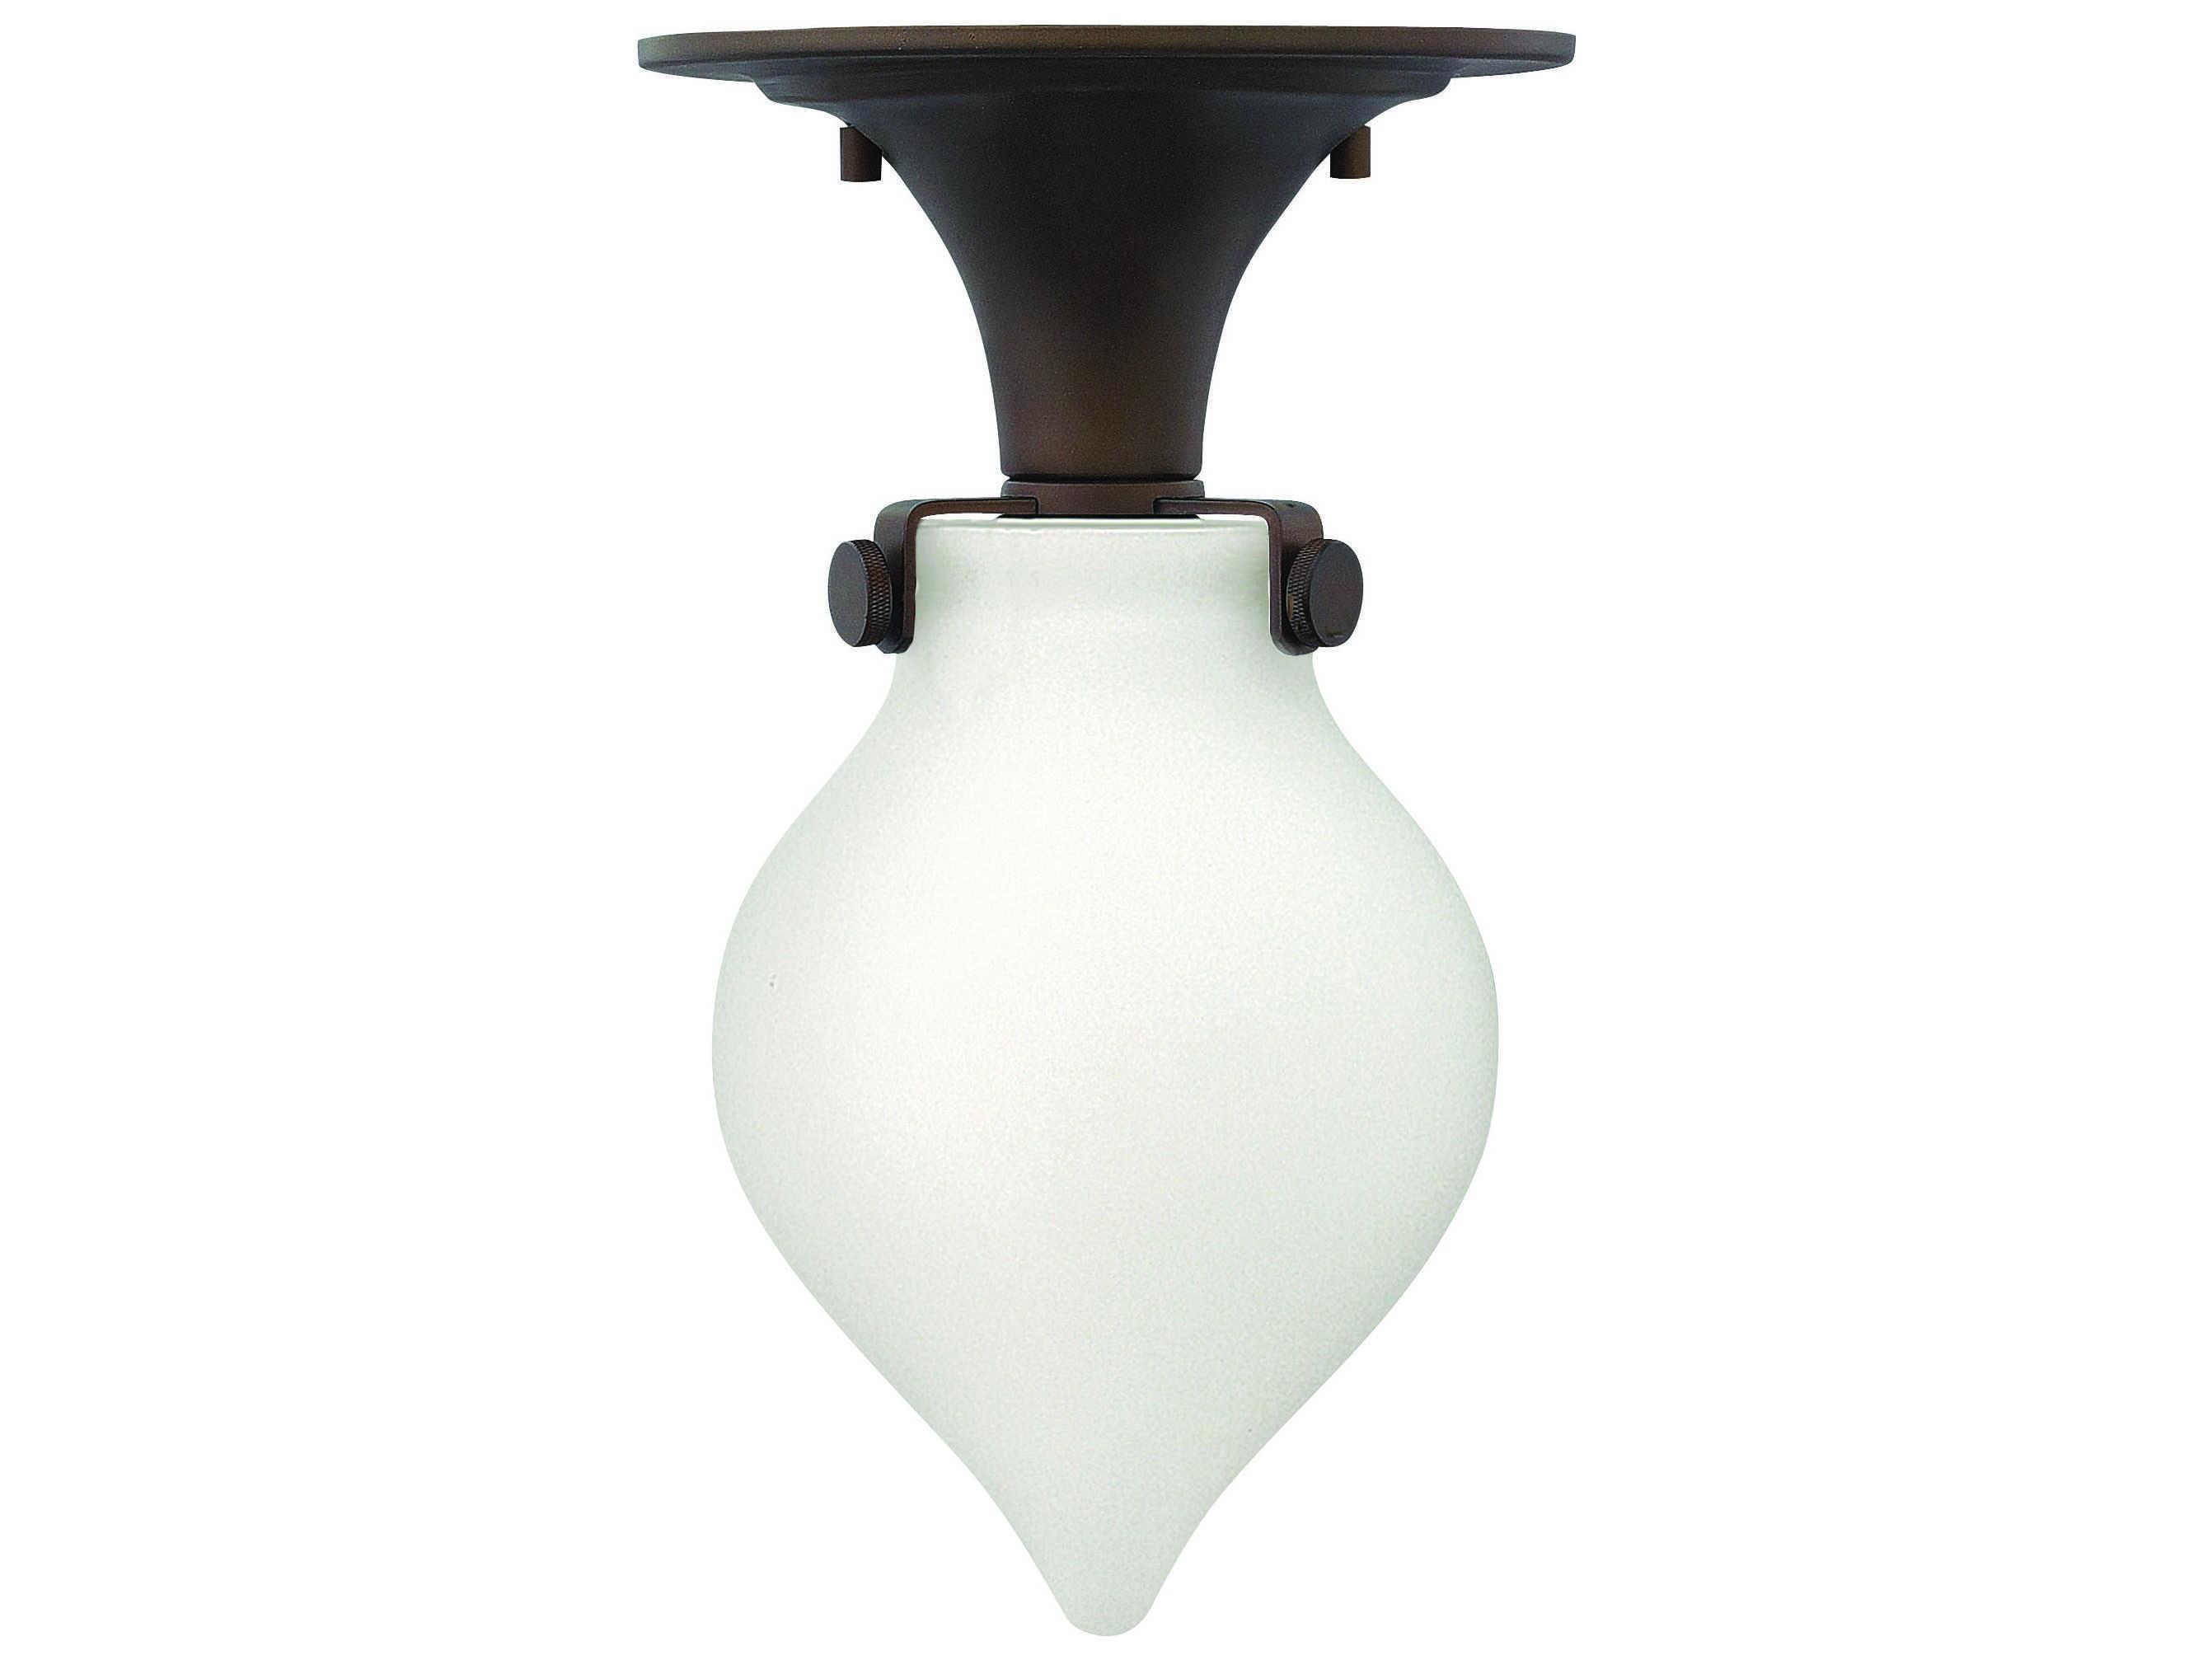 hinkley lighting congress oil rubbed bronze led semi flush mount light. Black Bedroom Furniture Sets. Home Design Ideas